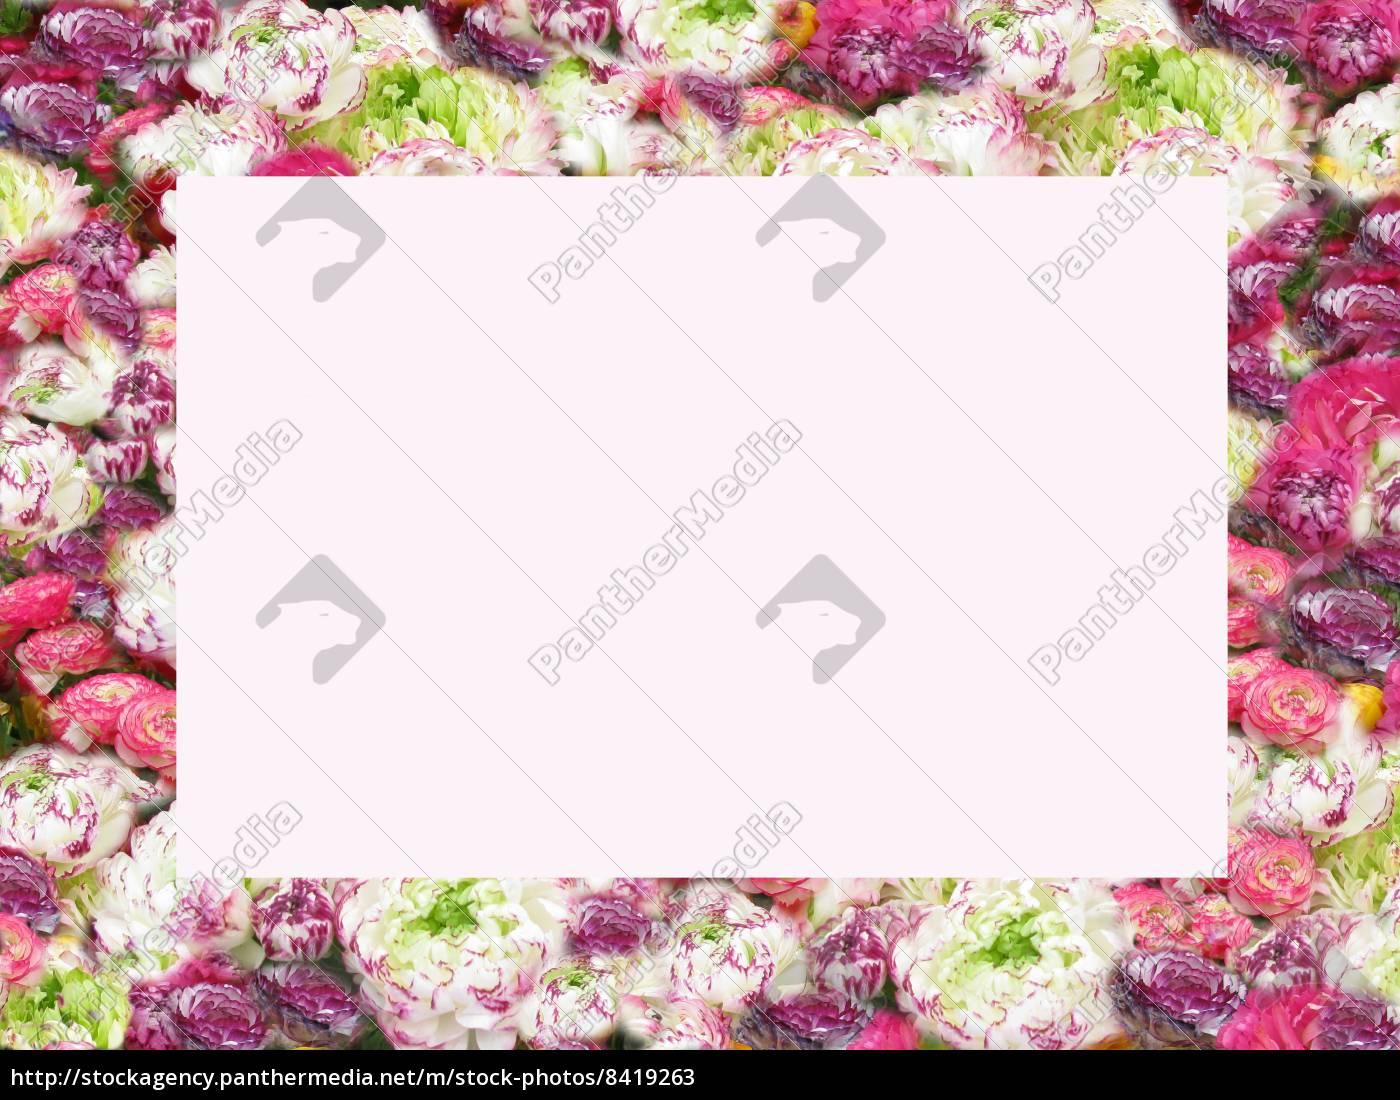 Blumenrahmen, bunte Ranunkeln - Stockfoto - #8419263 - Bildagentur ...